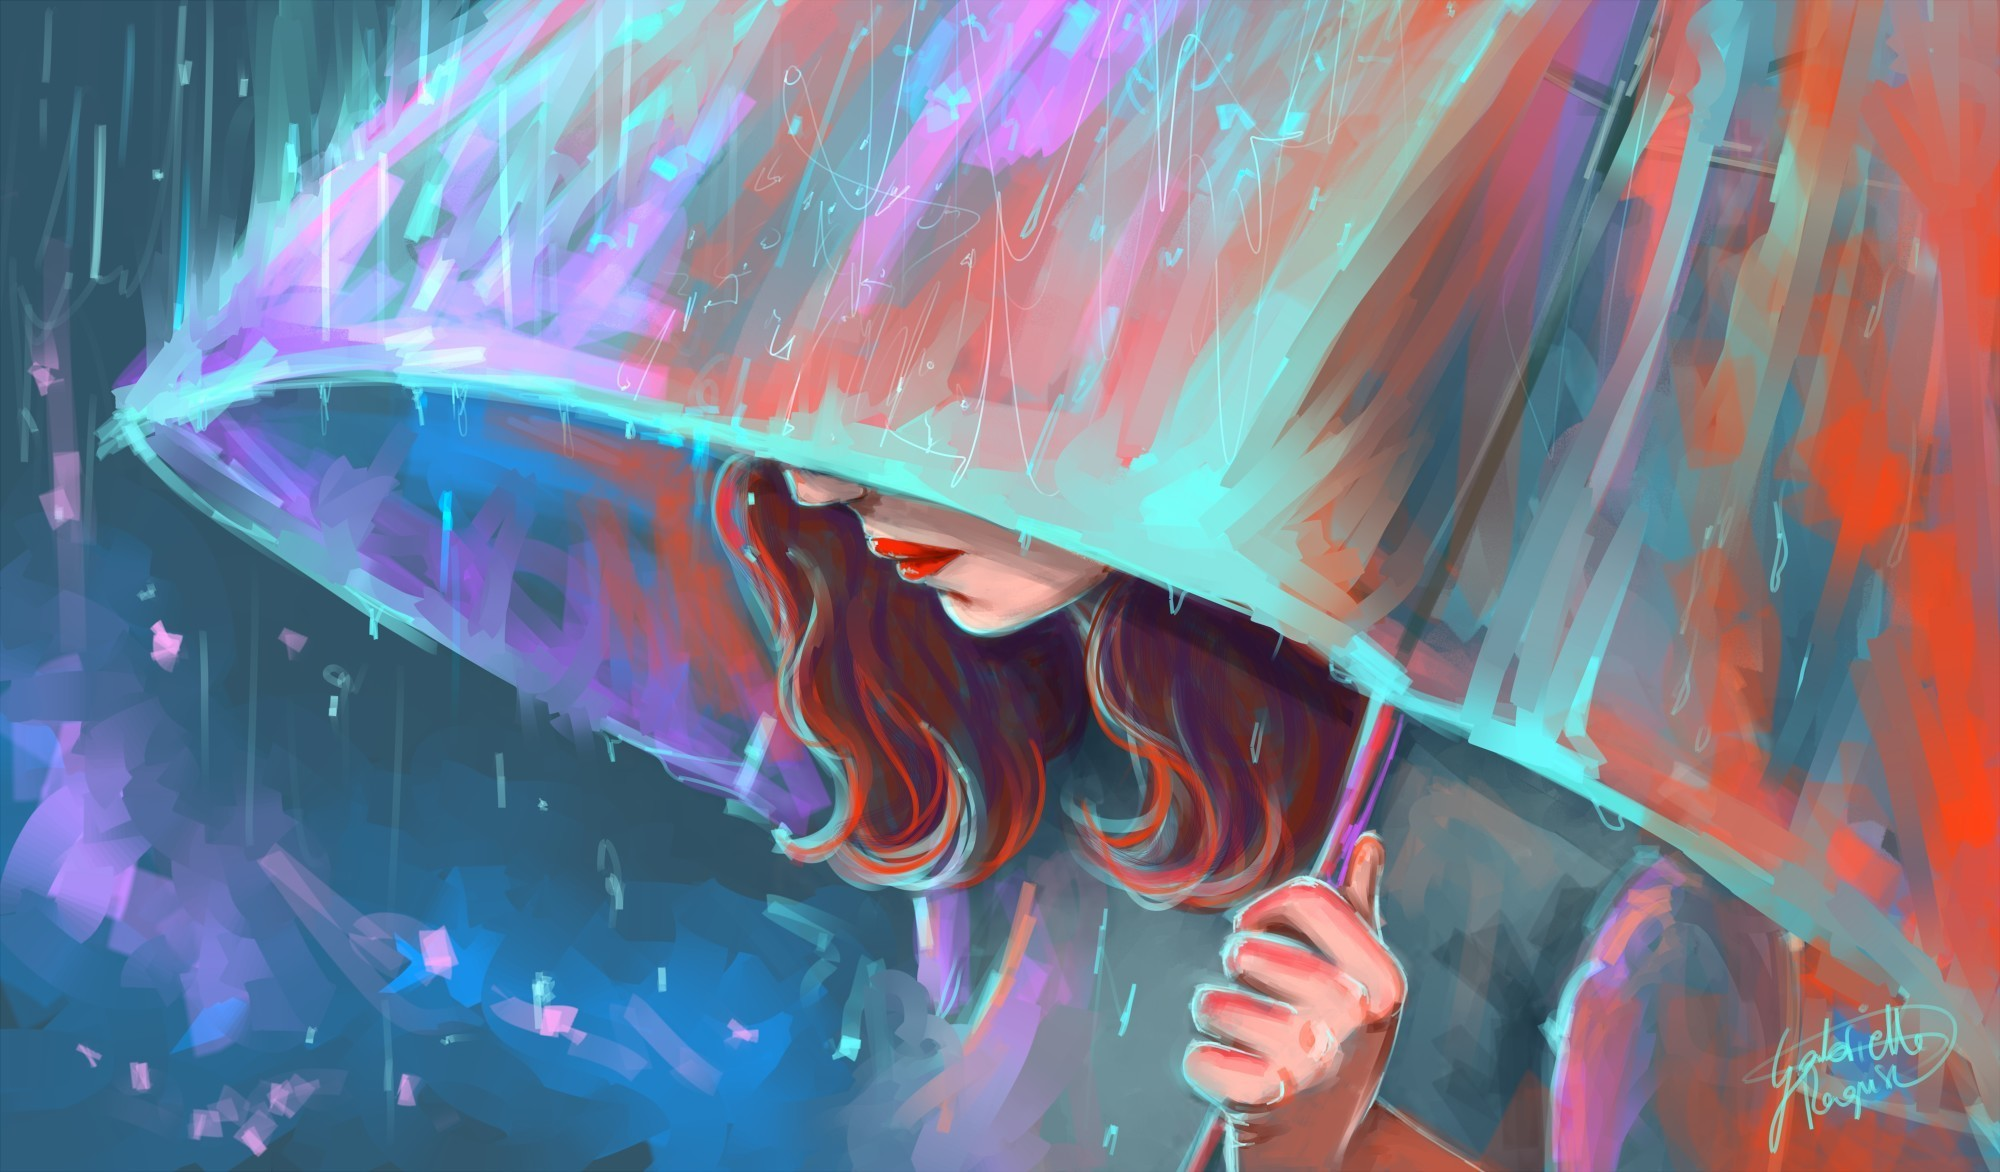 young woman Rain parasol Painting Art